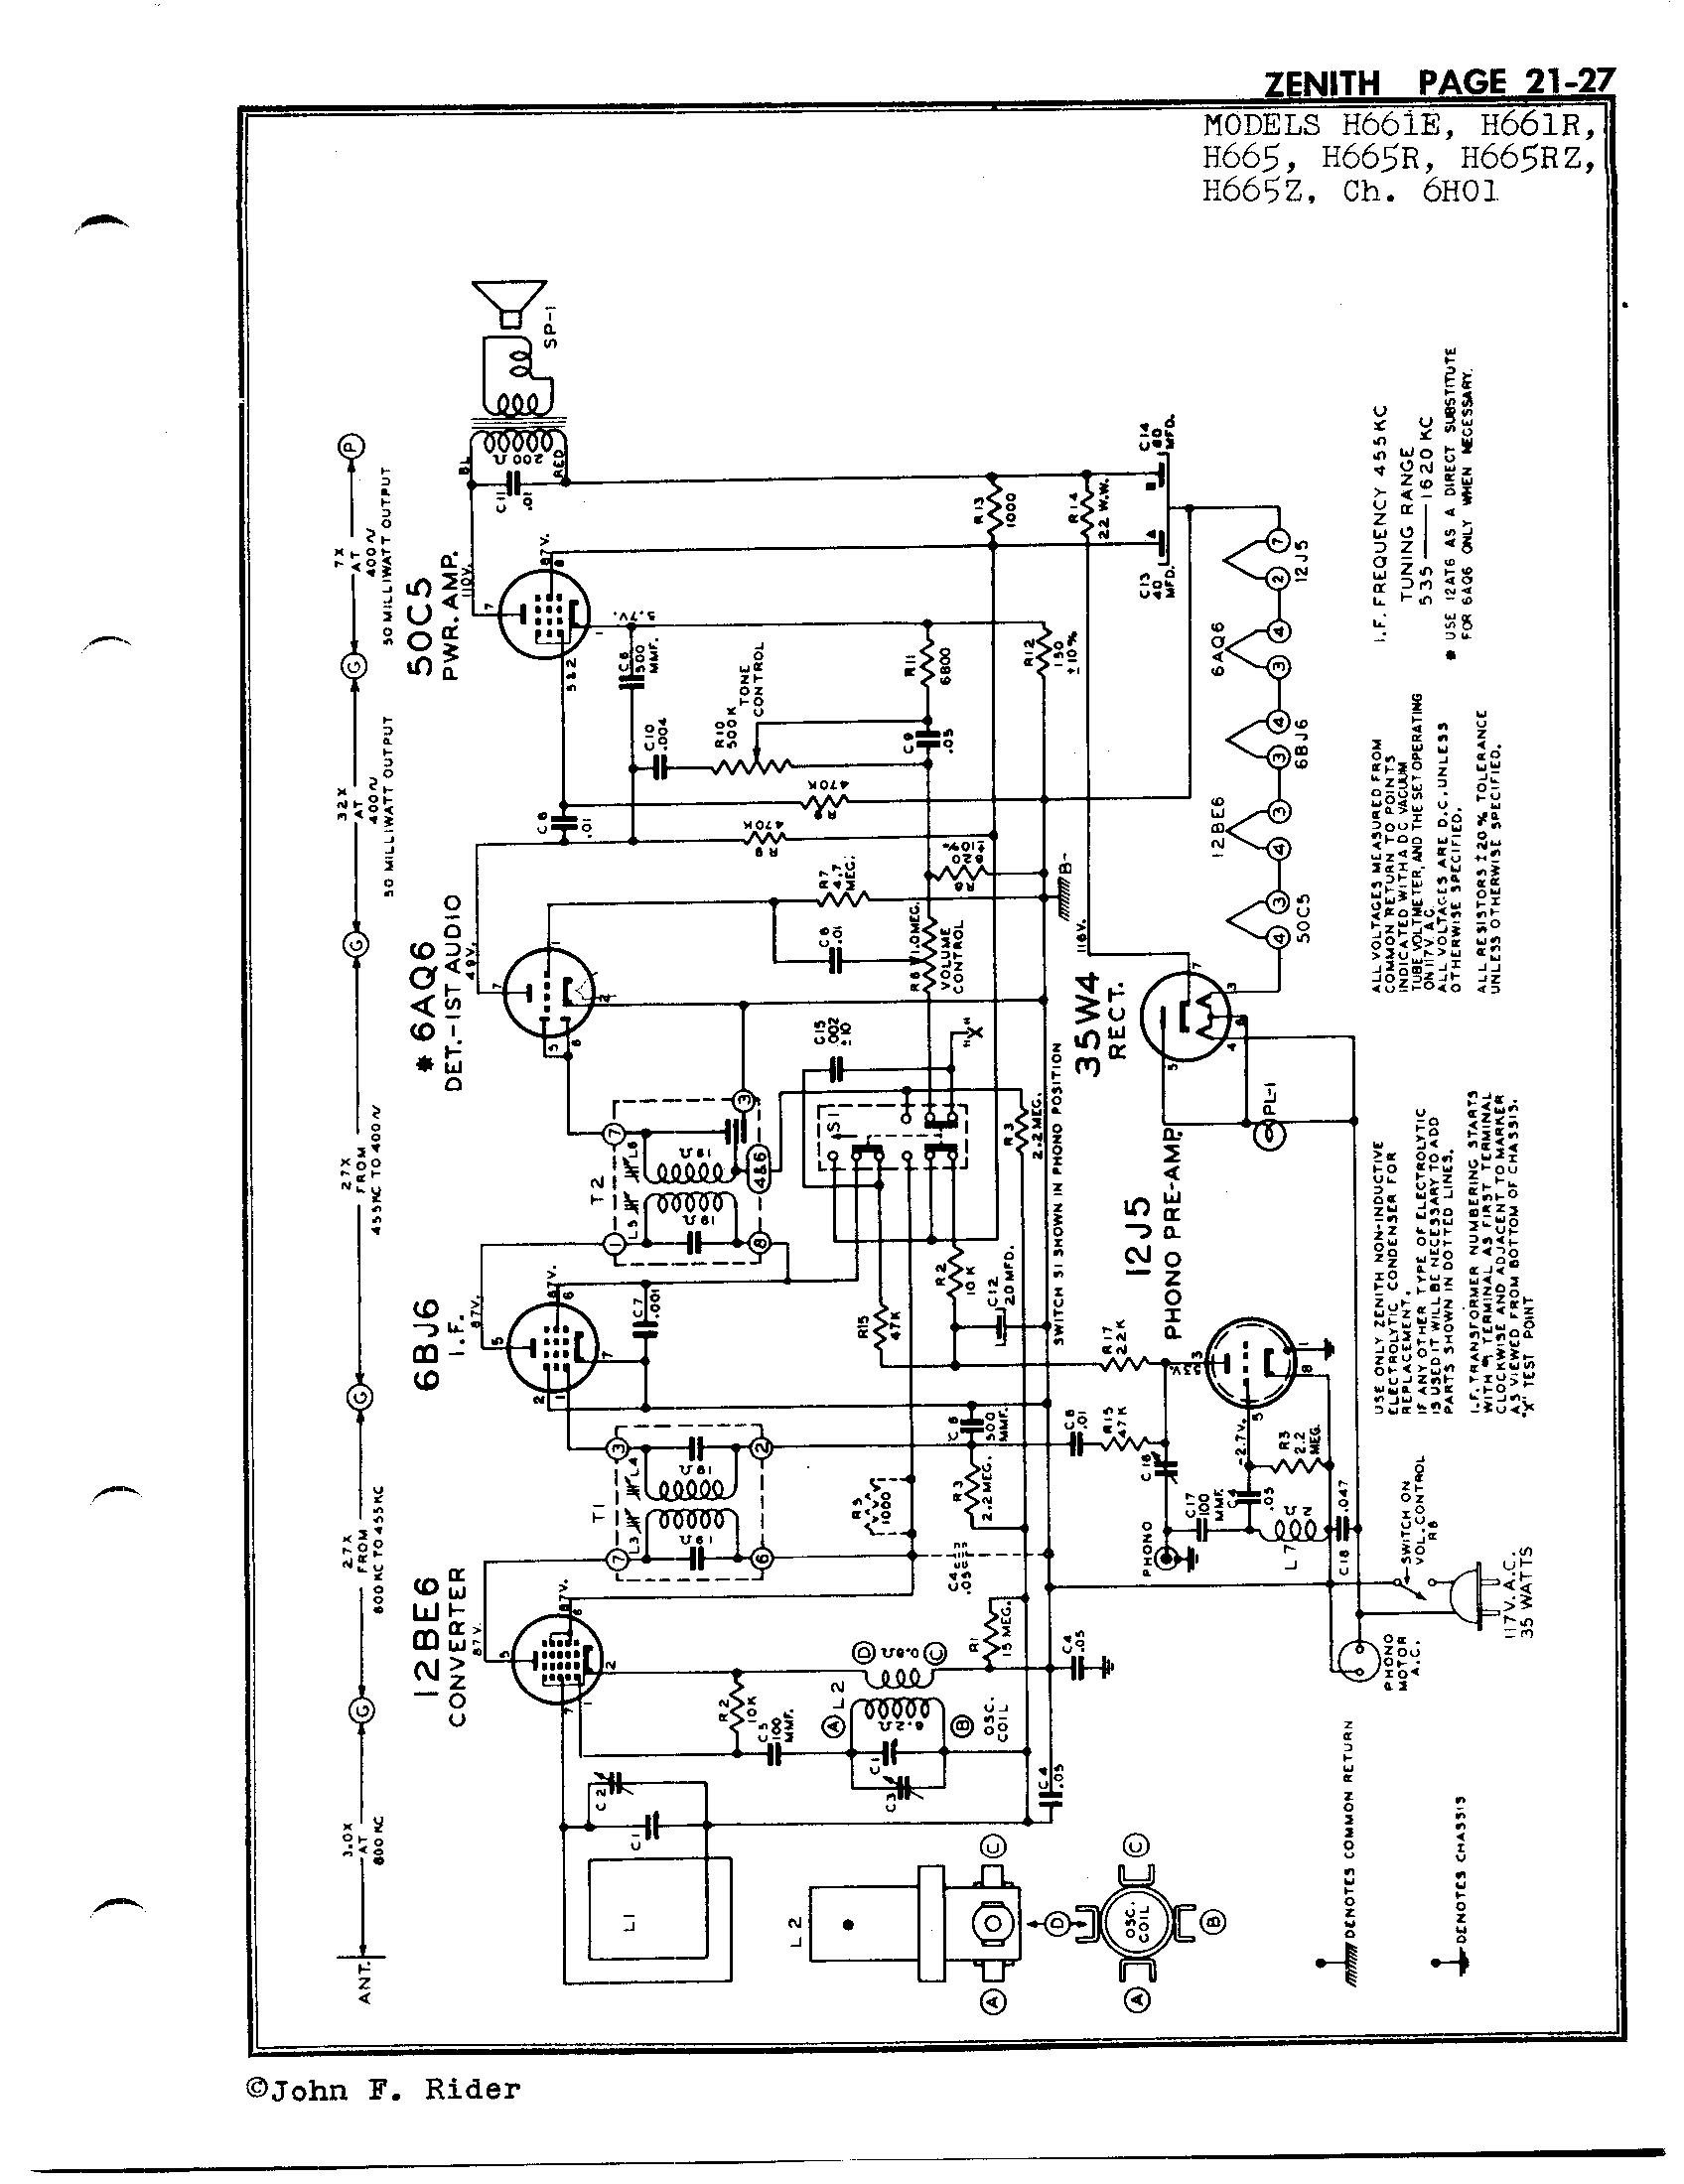 zenith tube radio schematics wiring diagram database Zenith Radio Serial Number Search zenith radio corp h665 antique electronic supply zenith 35a tube radio schematics schematic pages